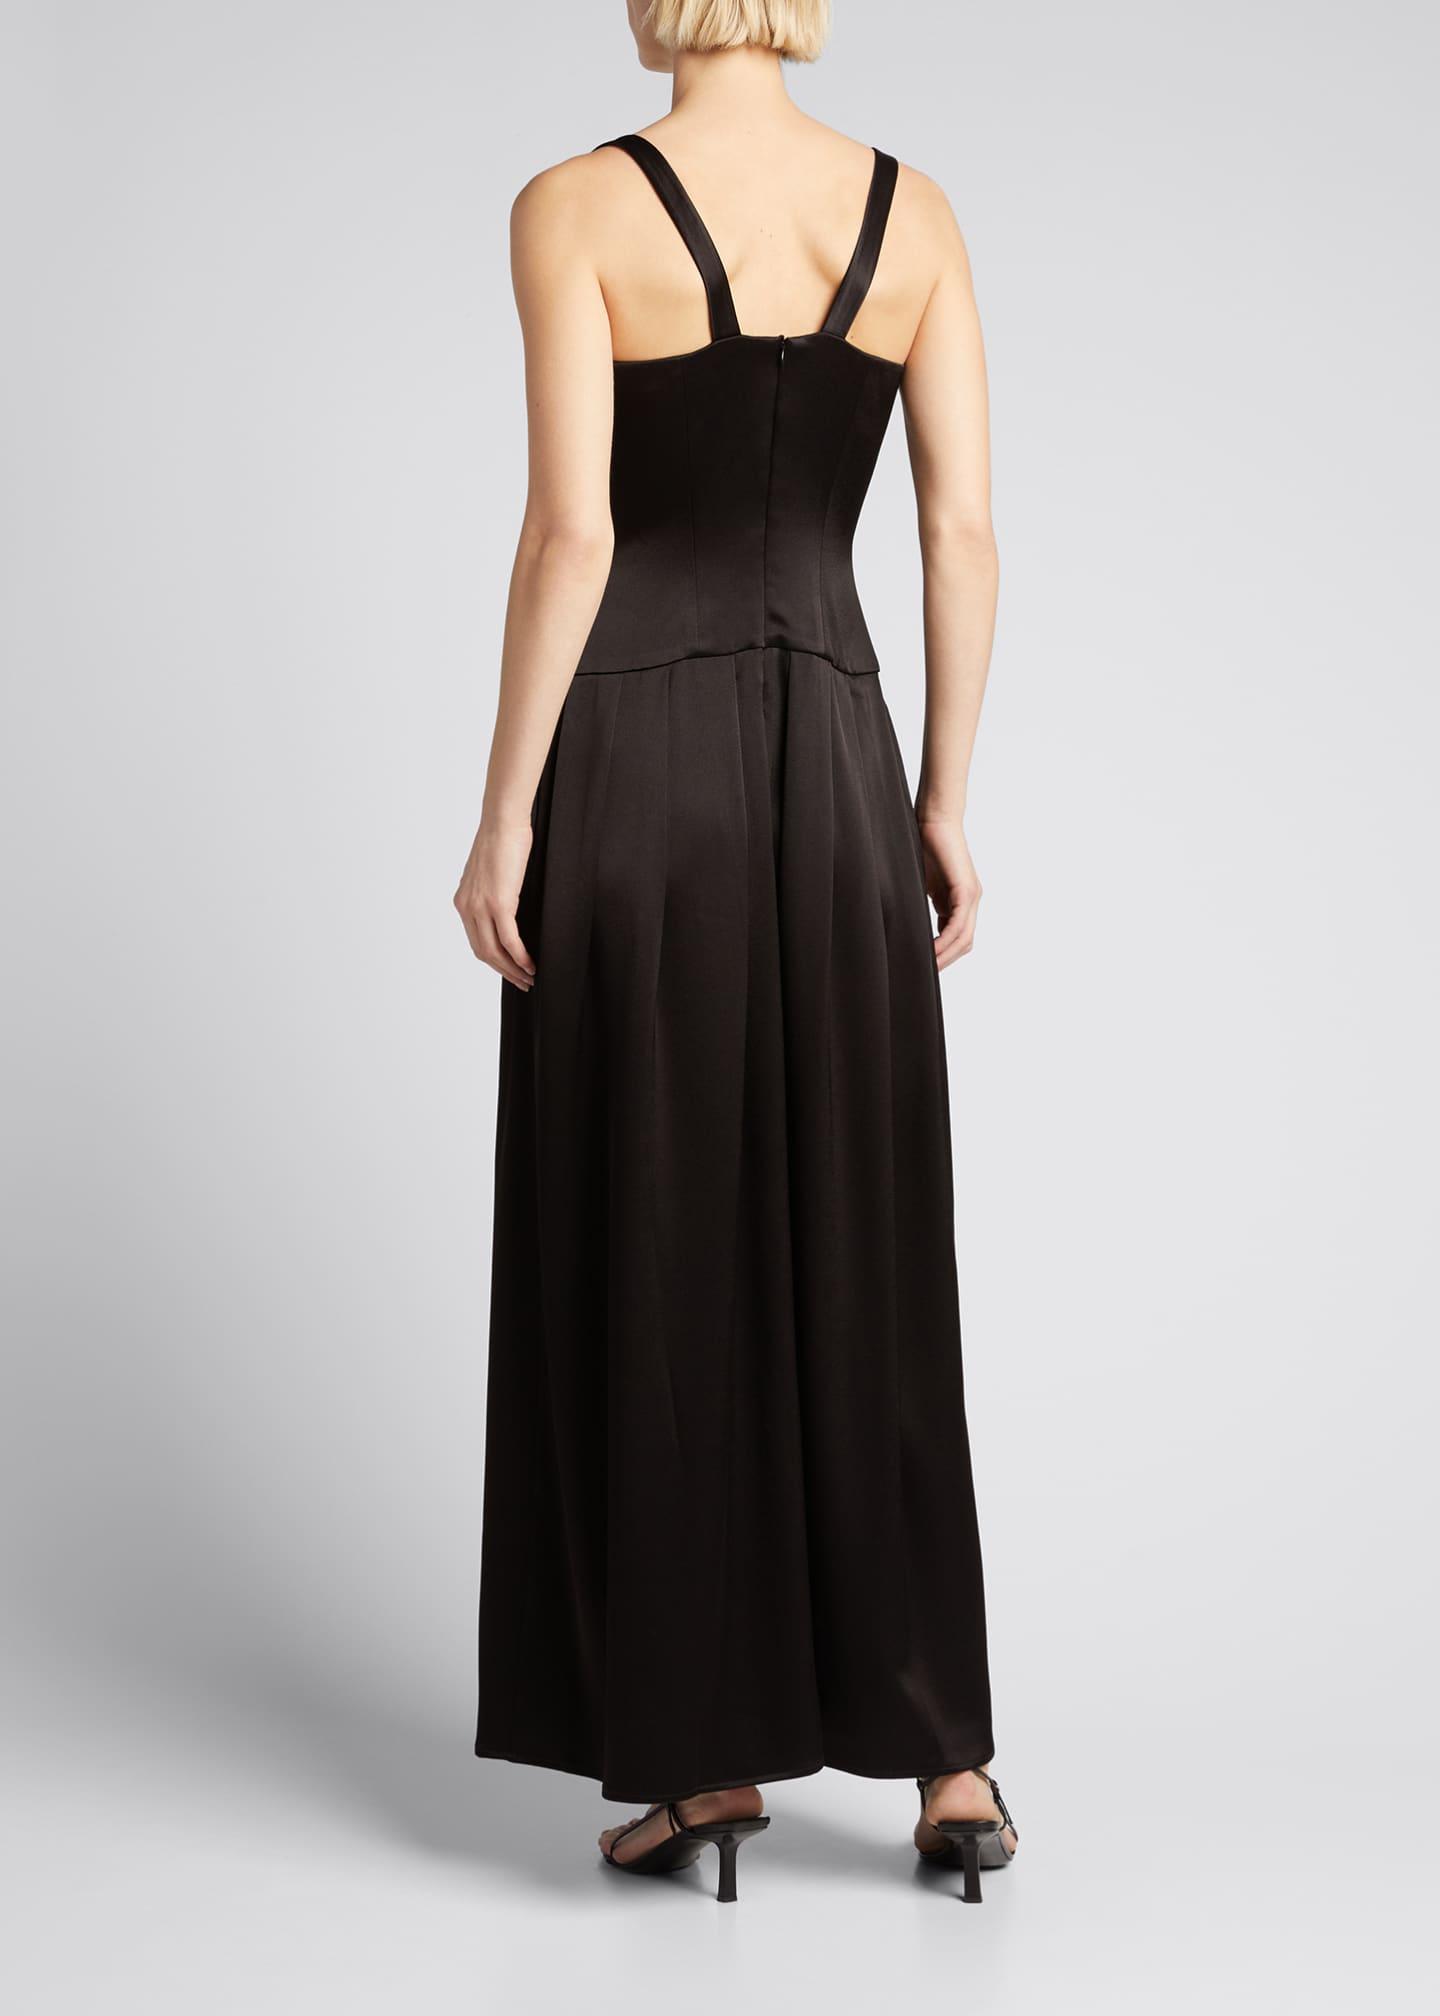 ASOS TALL Pleated Paneled Satin Maxi Dress - Multi   Satin